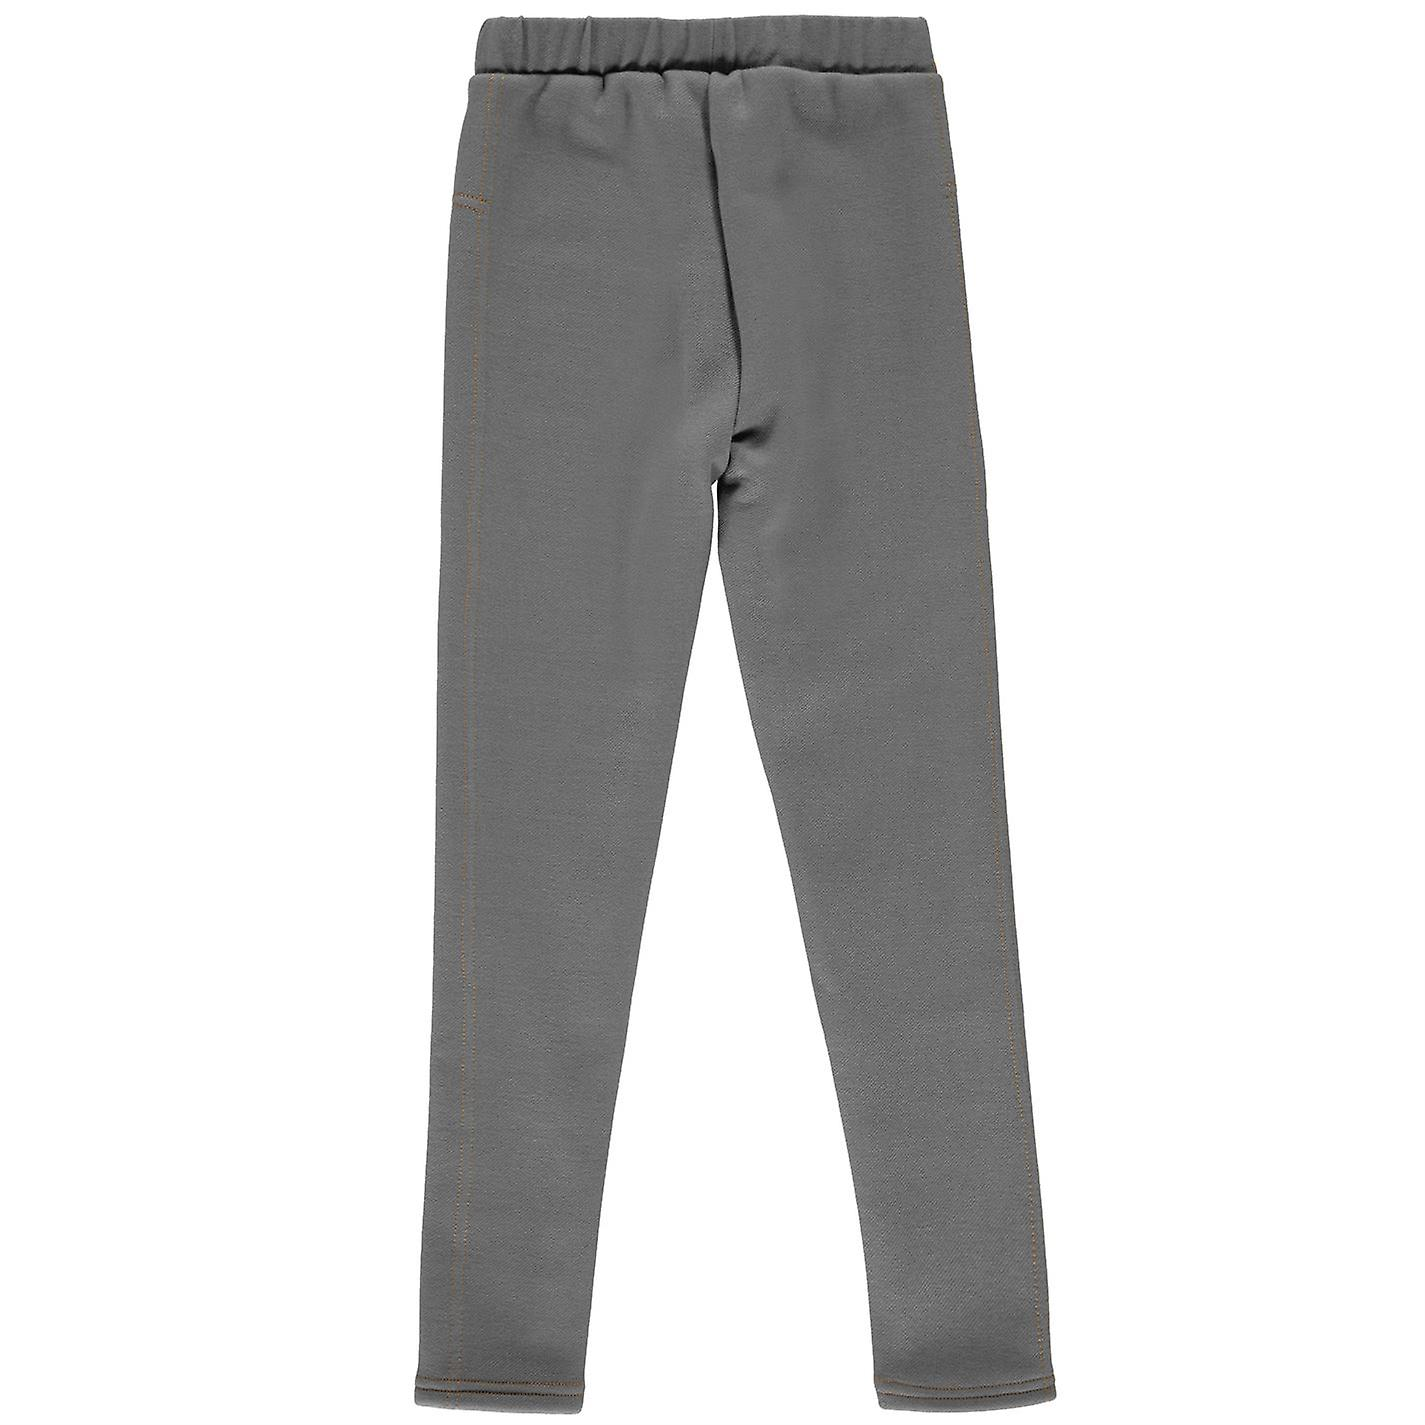 Miso Kids Girls Lined Leggings Pants Trousers Bottoms Elasticated Waist